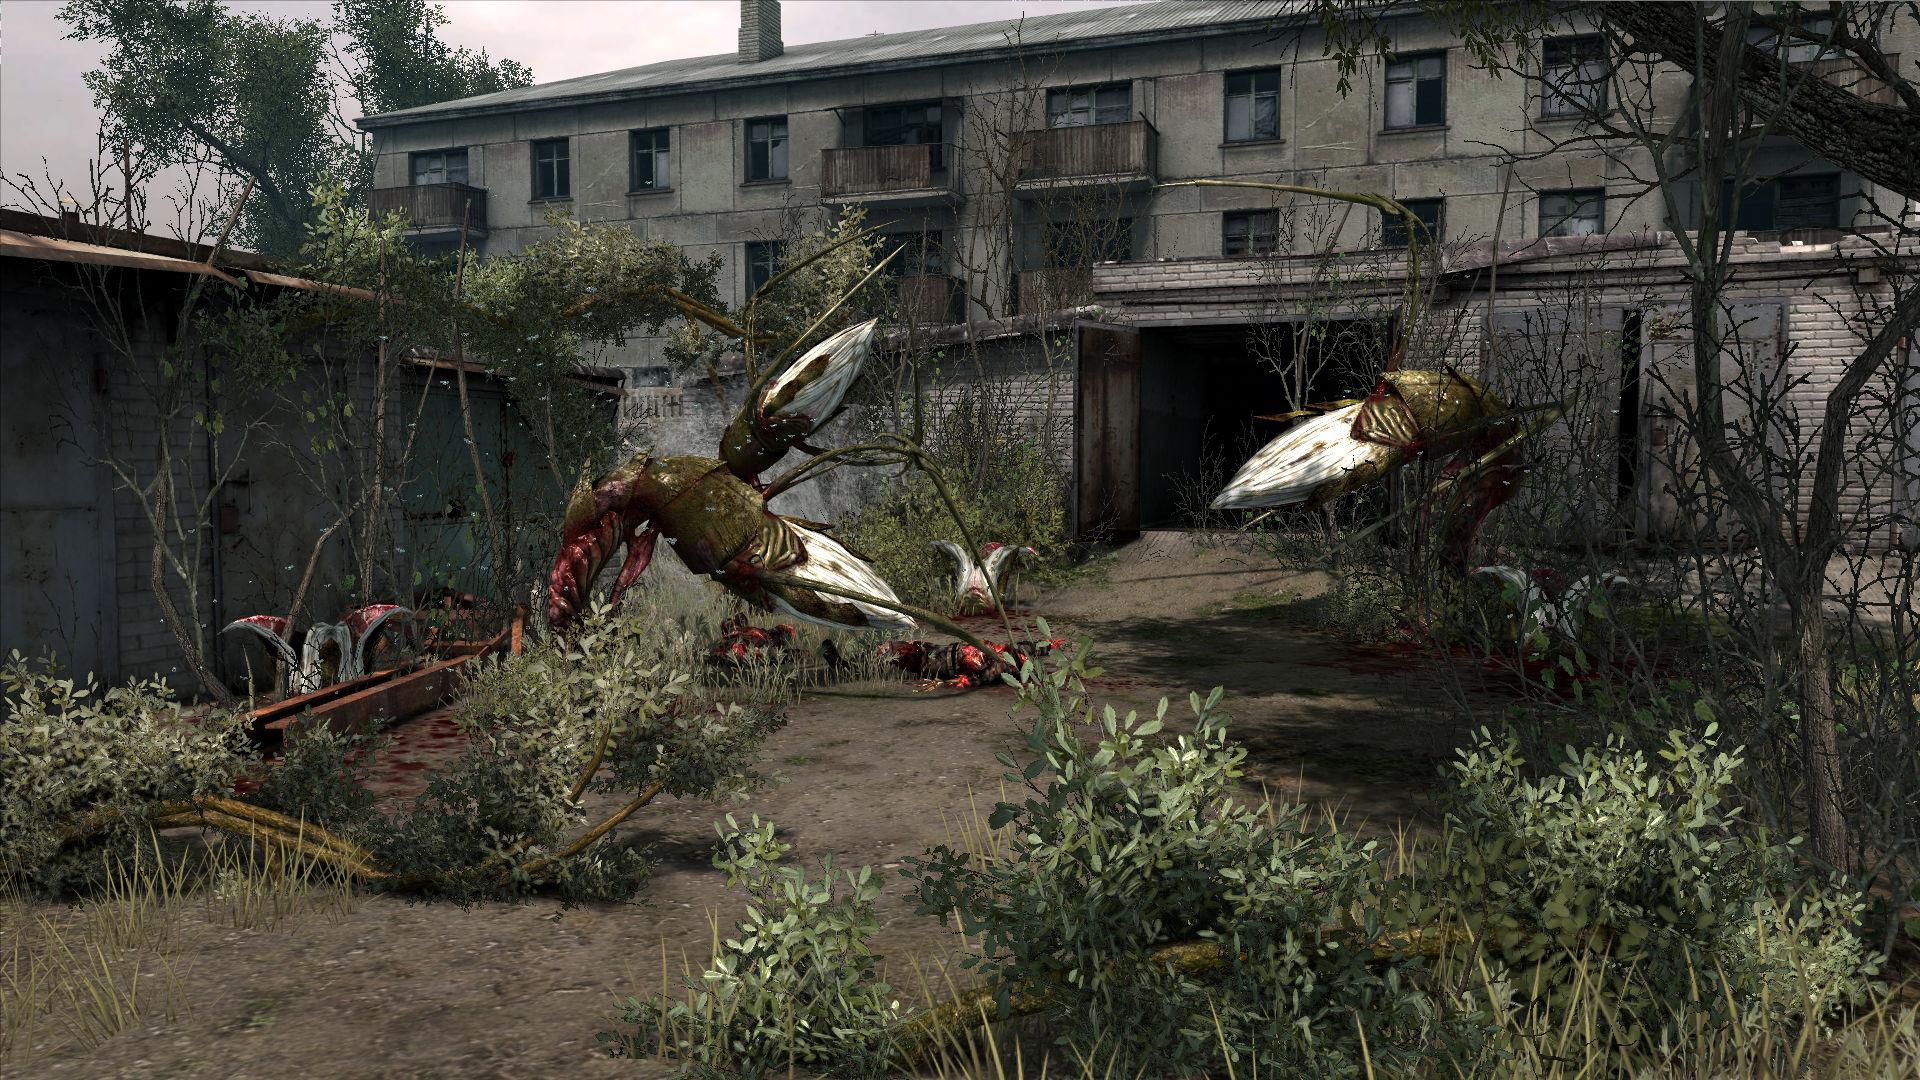 Obrázky z post-apokalyptického RPG Novy Soyuz 69414